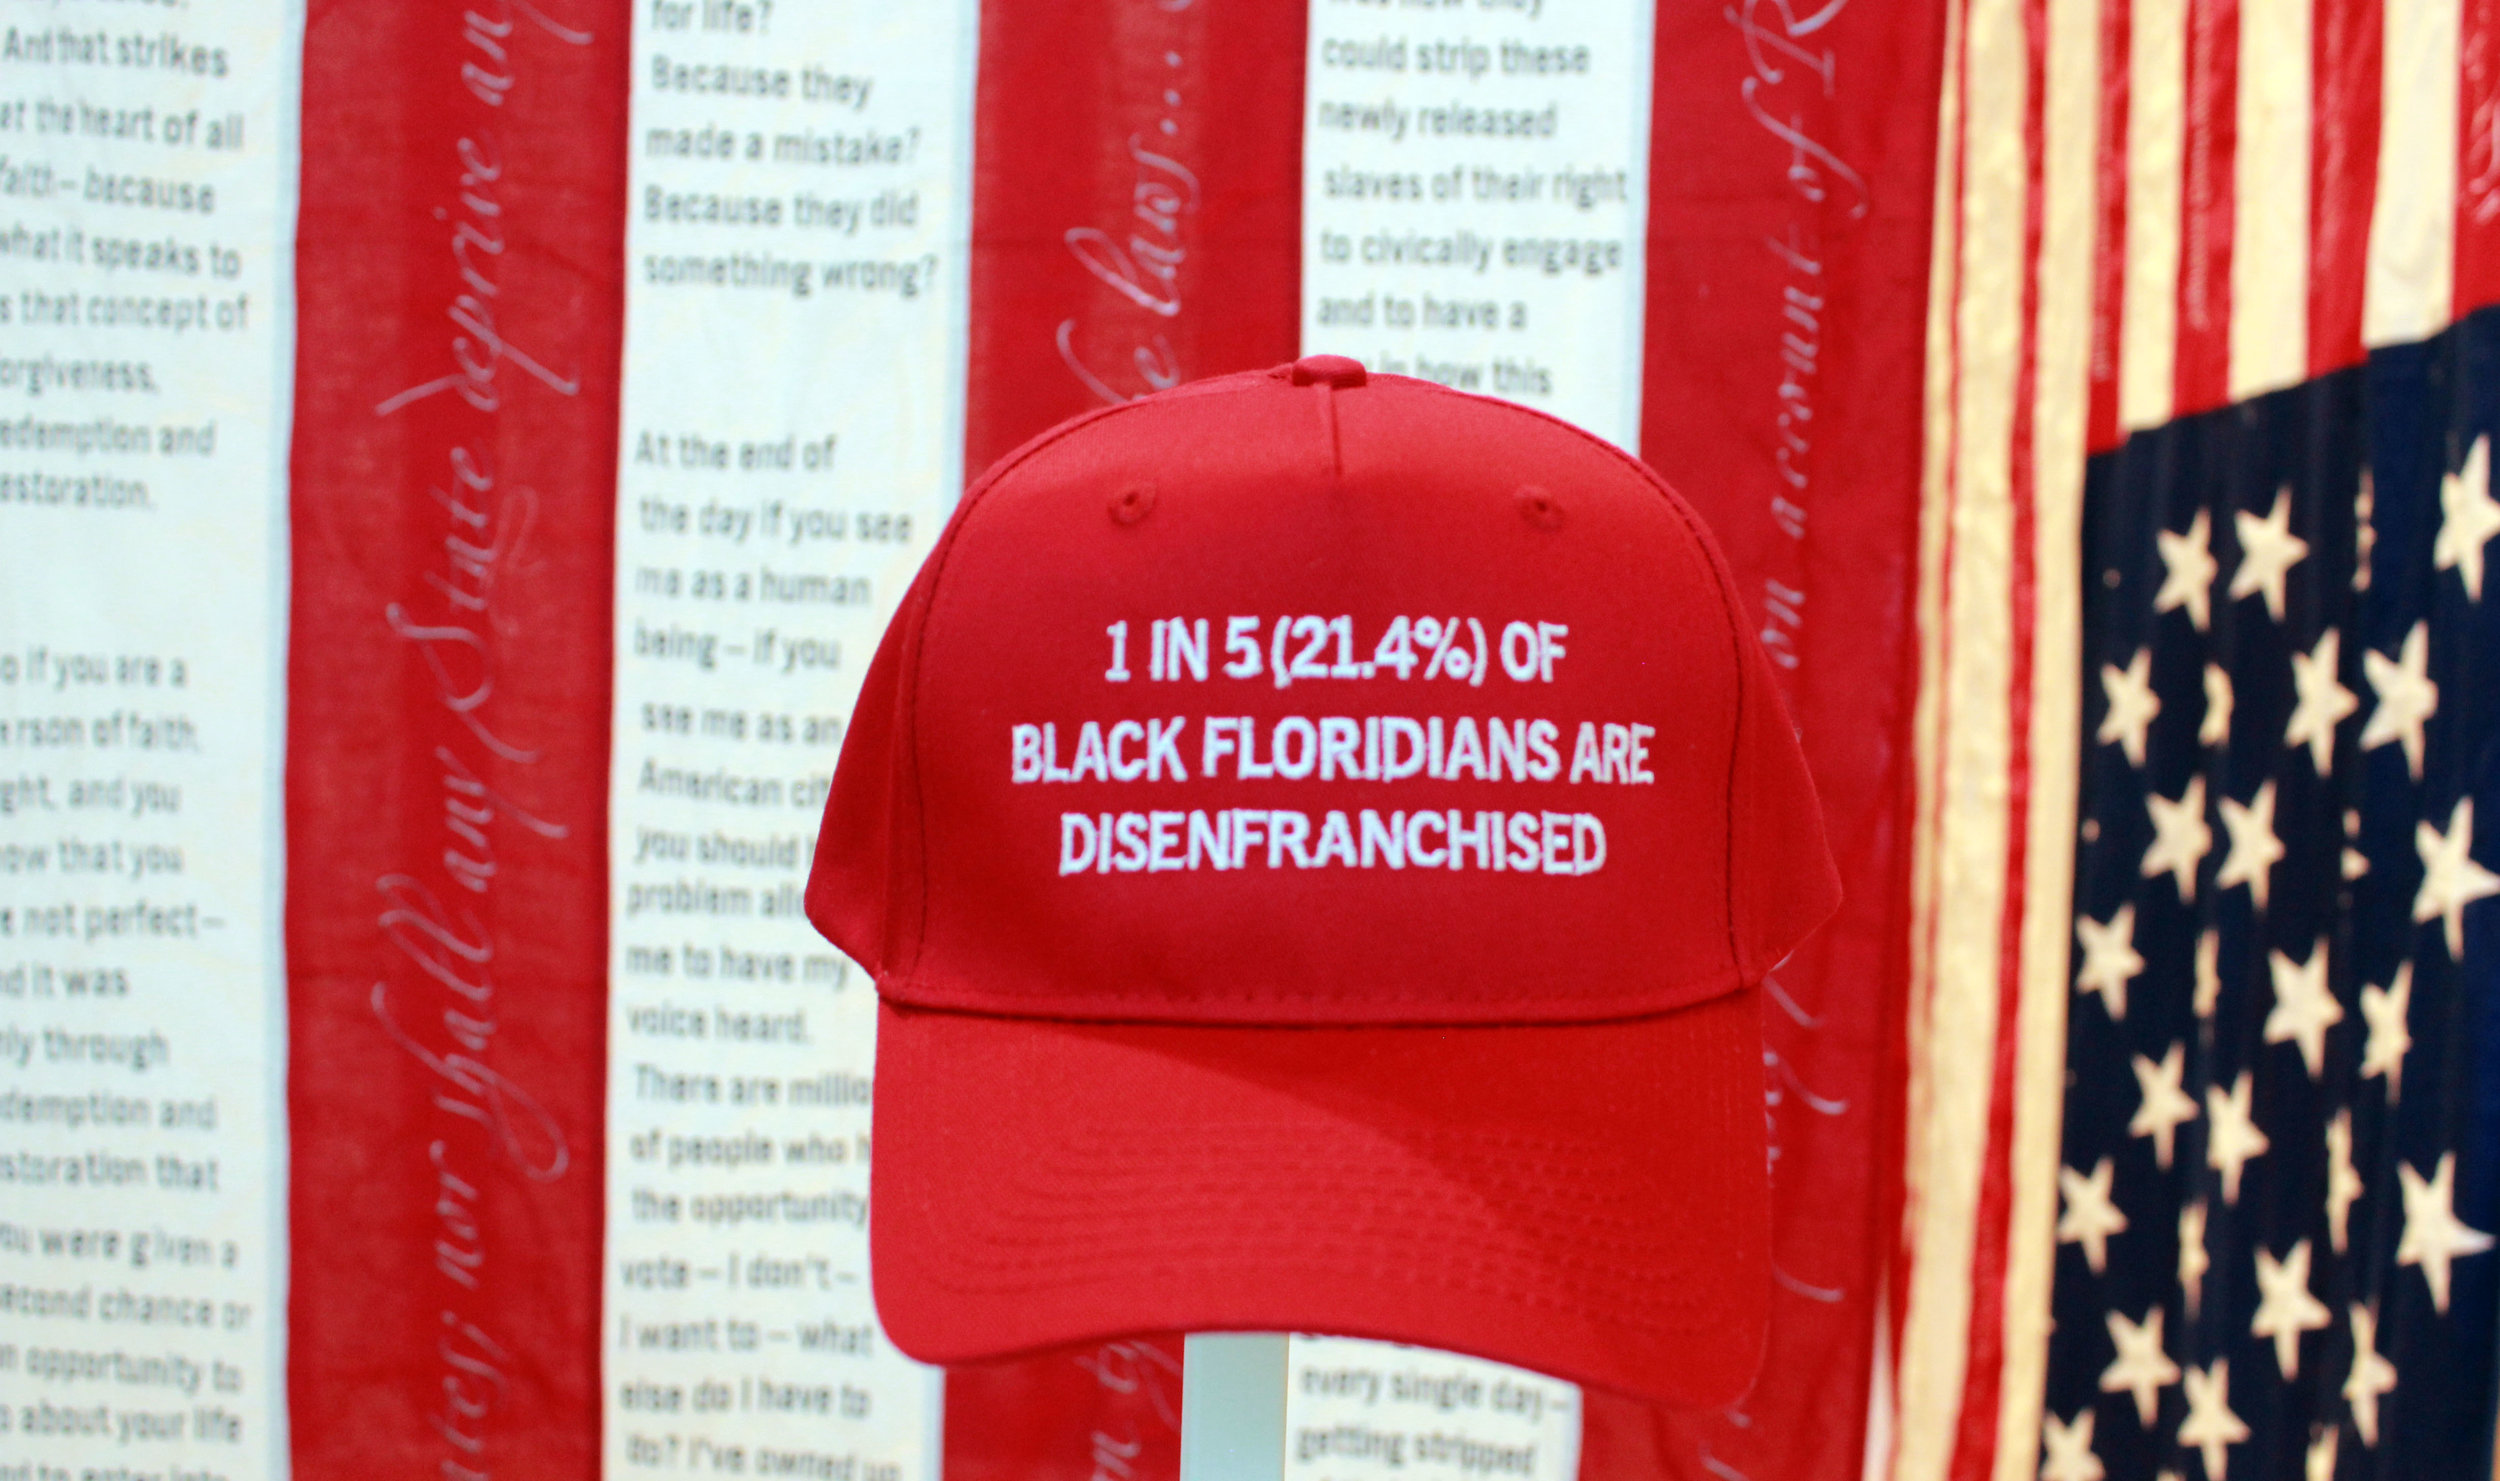 black_floridians.jpg